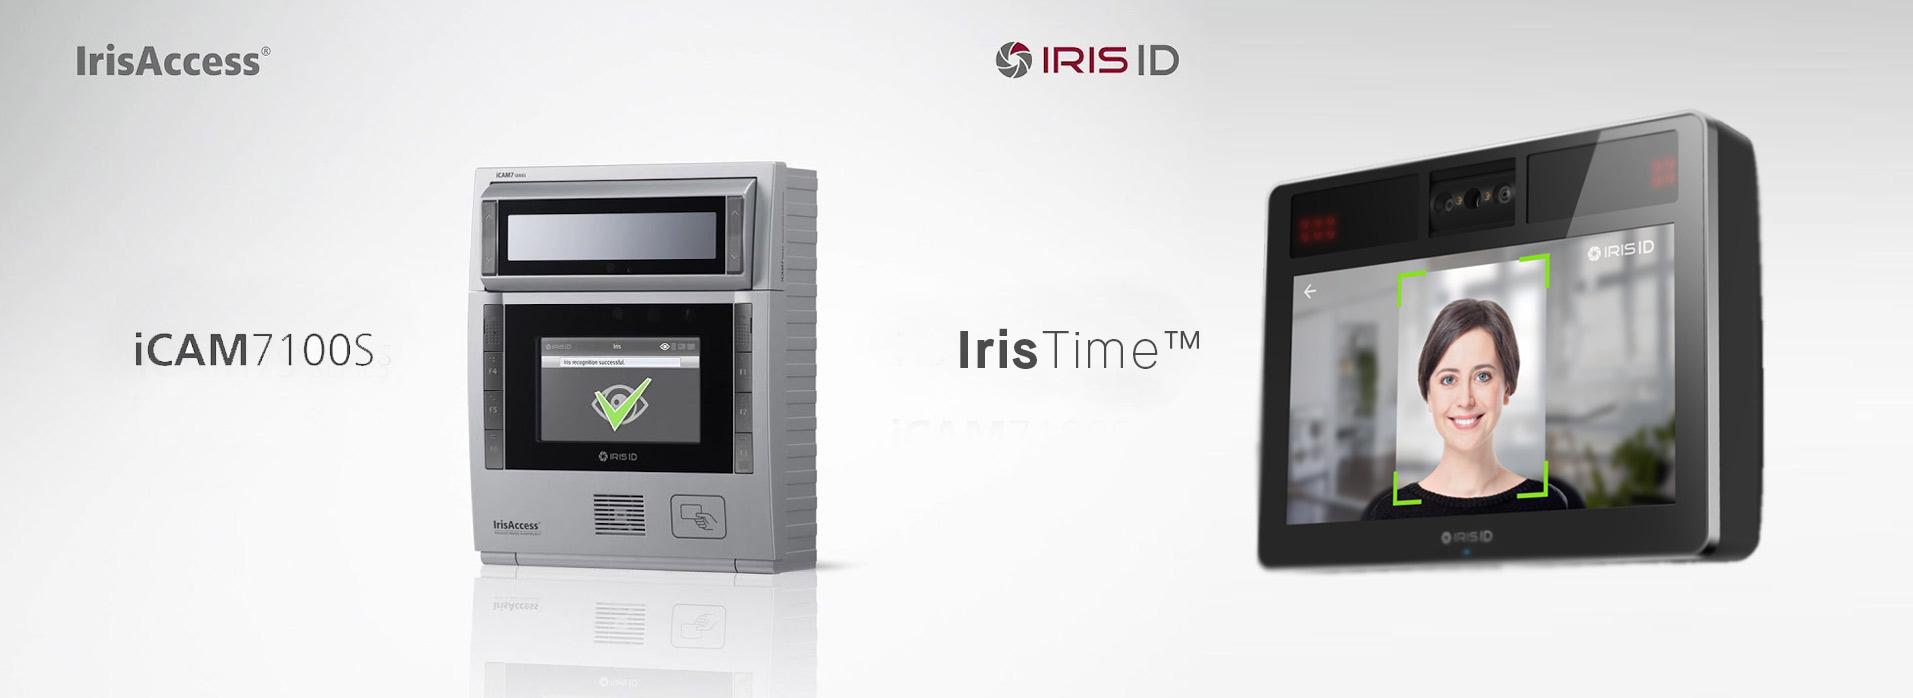 iCAM7100-Vs-IrisTime